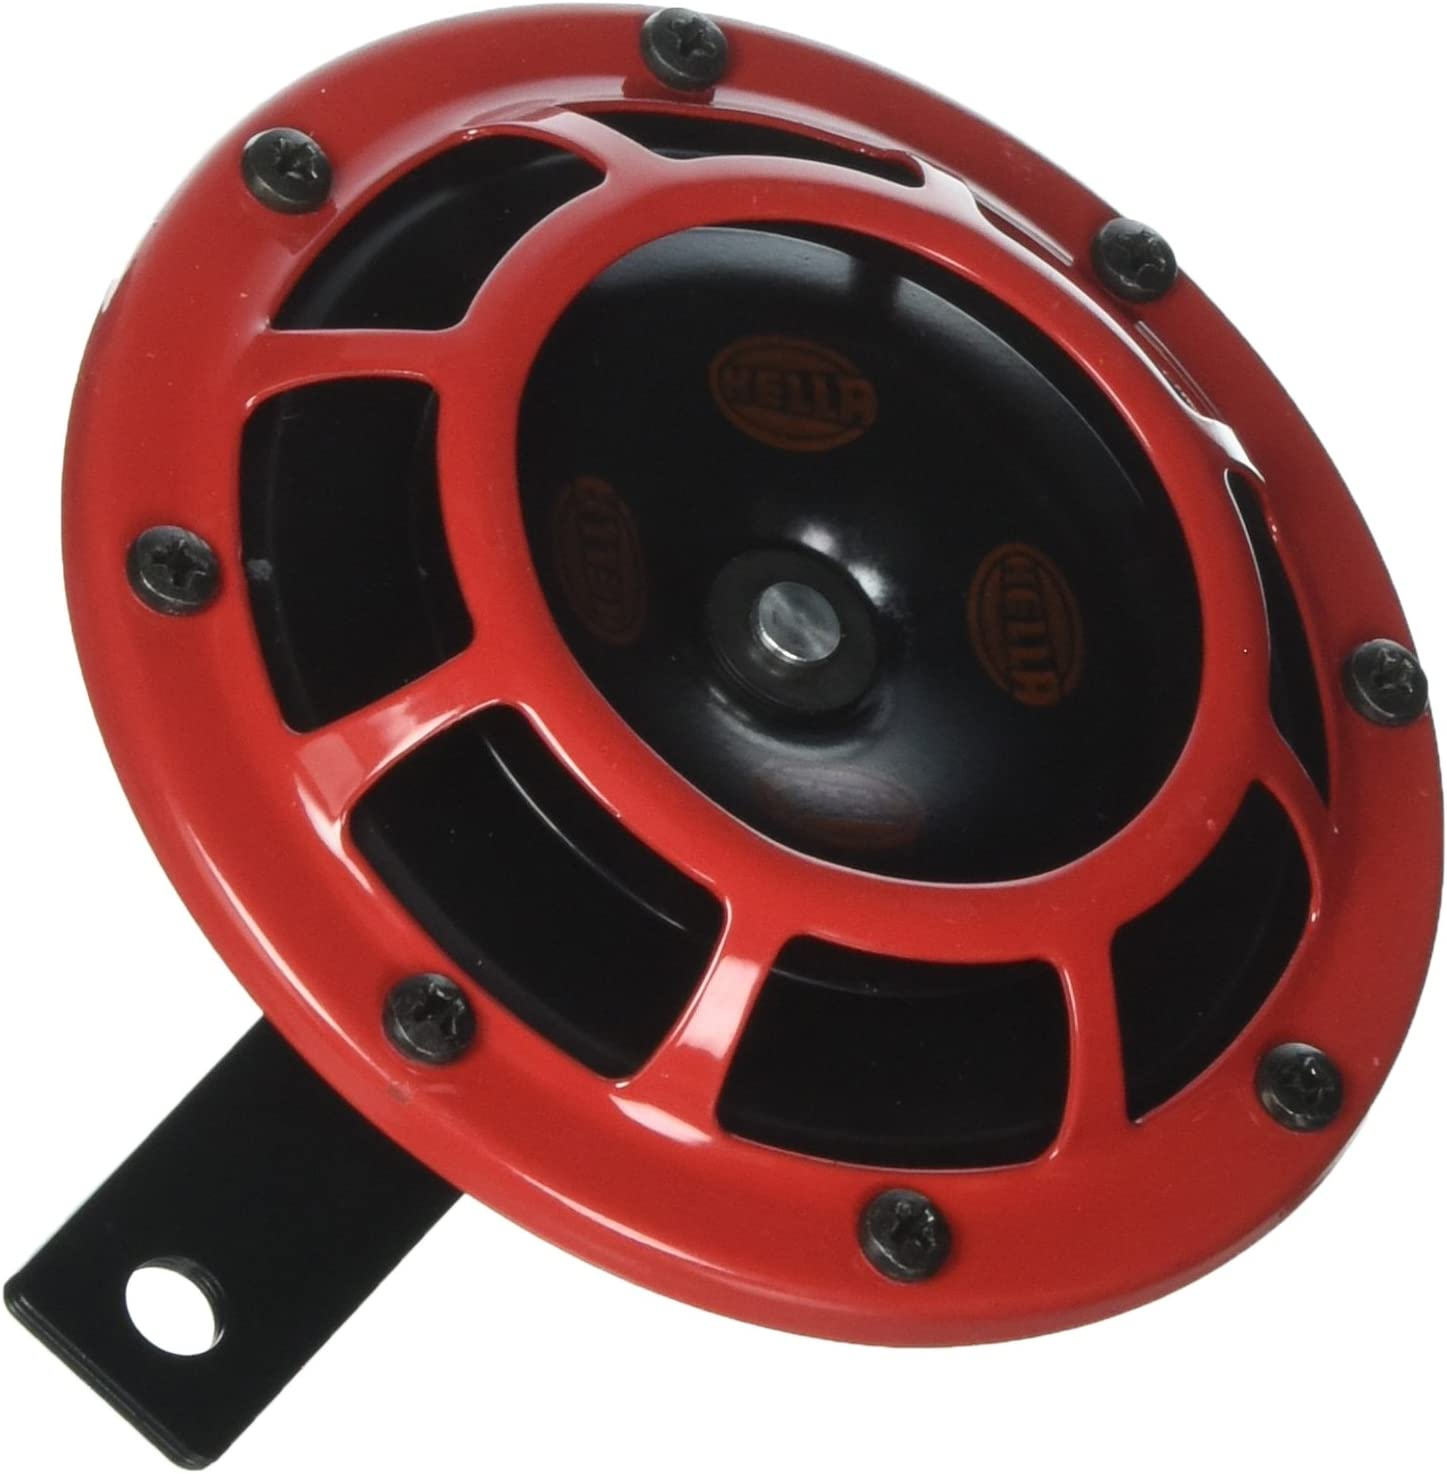 HELLA Loud Super Tone Electric Horn B133 KIT Red Black 12V 300-500Hz 66W